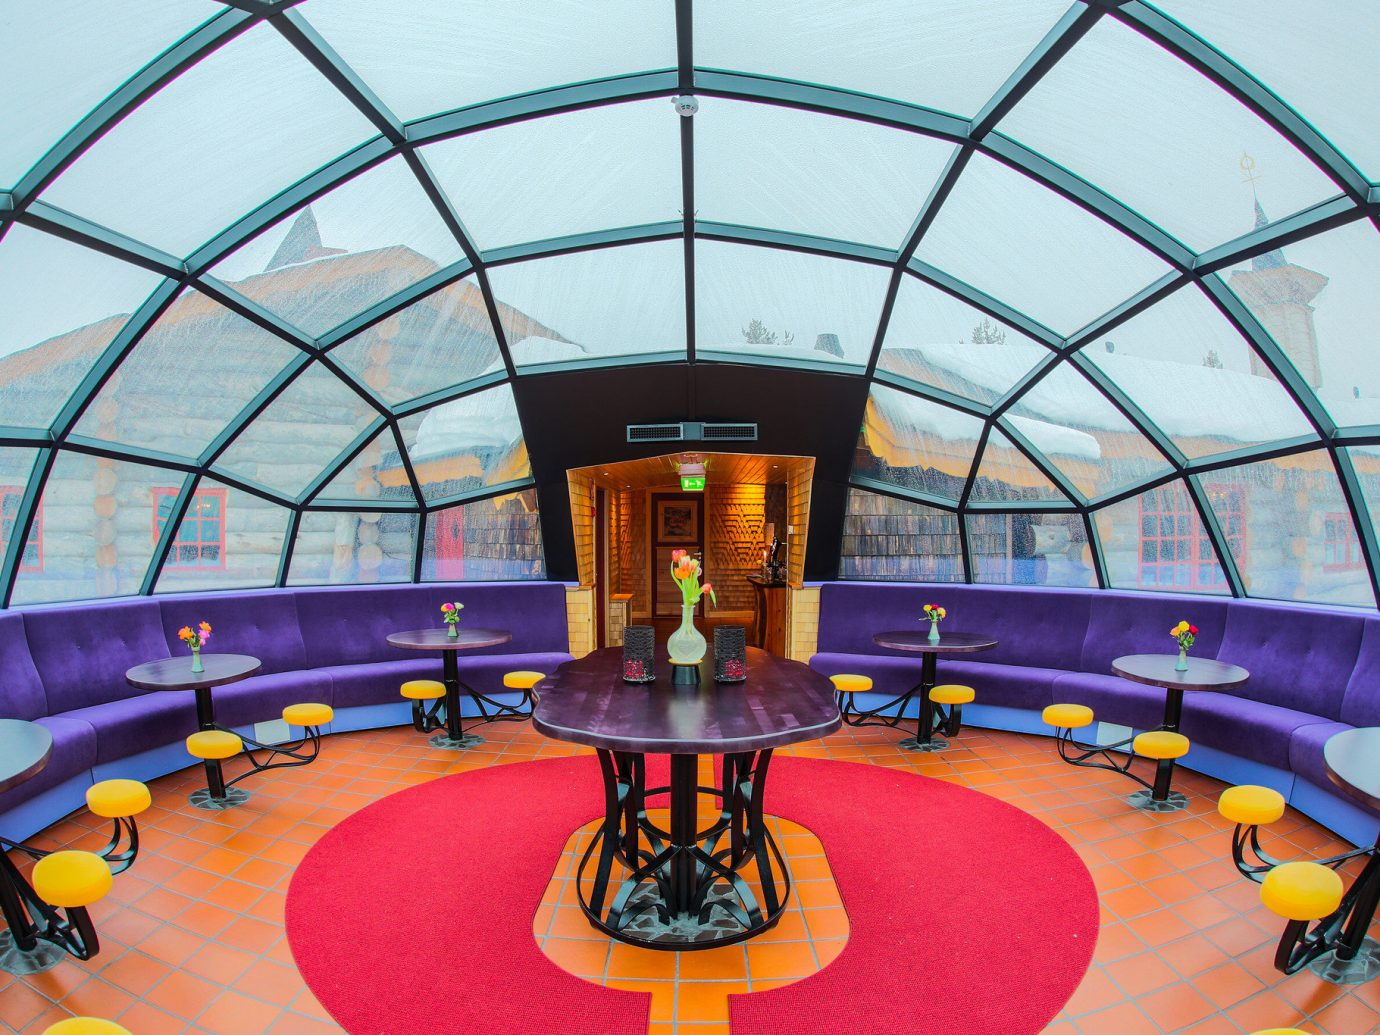 Hotels Offbeat Winter indoor building Architecture yellow structure leisure interior design leisure centre daylighting window